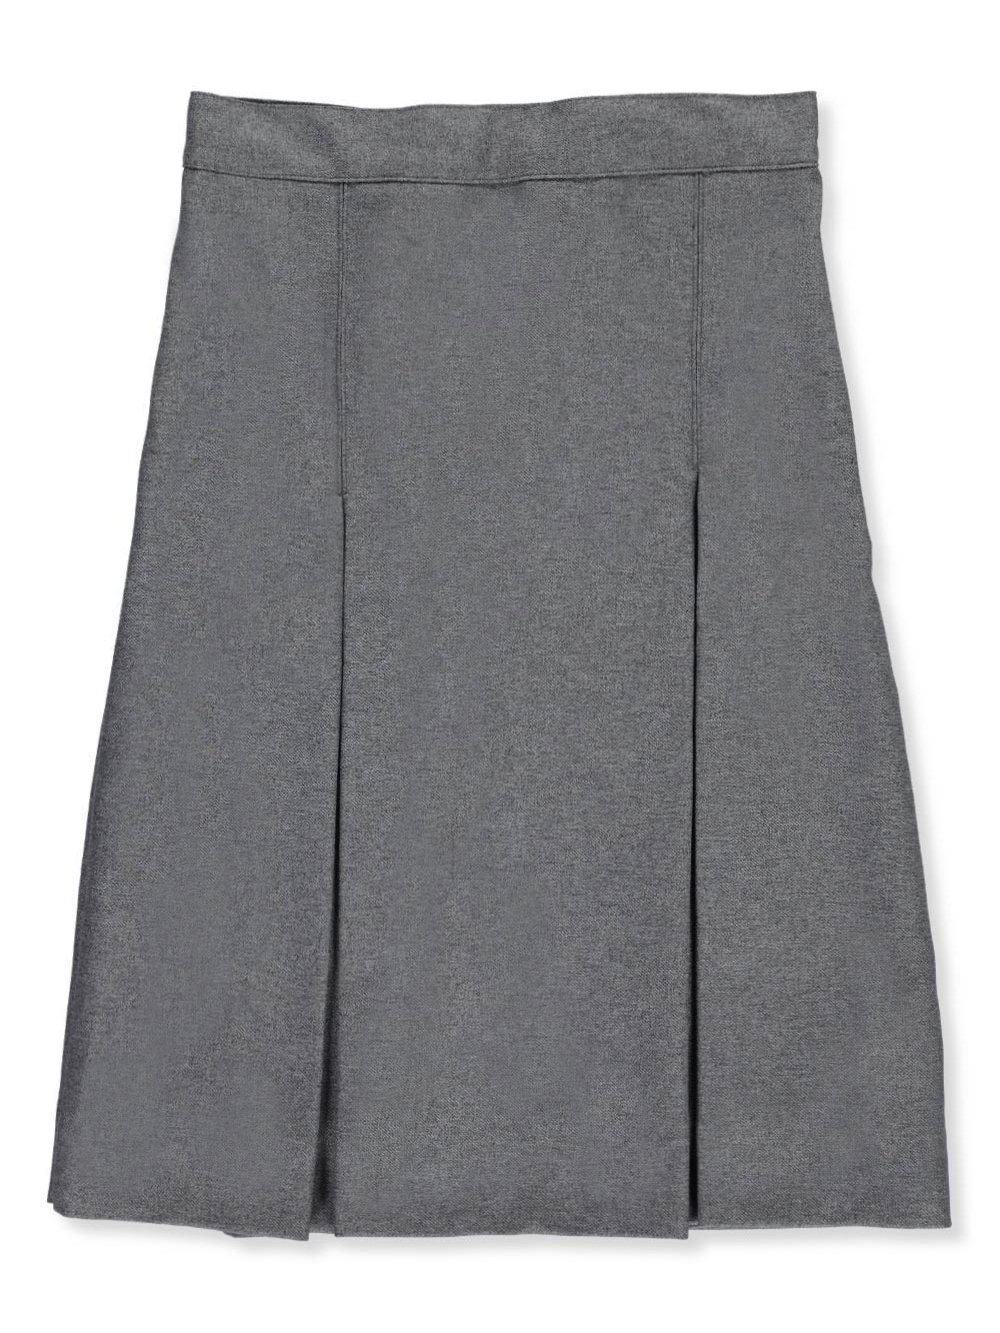 Cookie's Brand Big Girls' Plus 3'' Box Pleat Skirt - Gray, 18